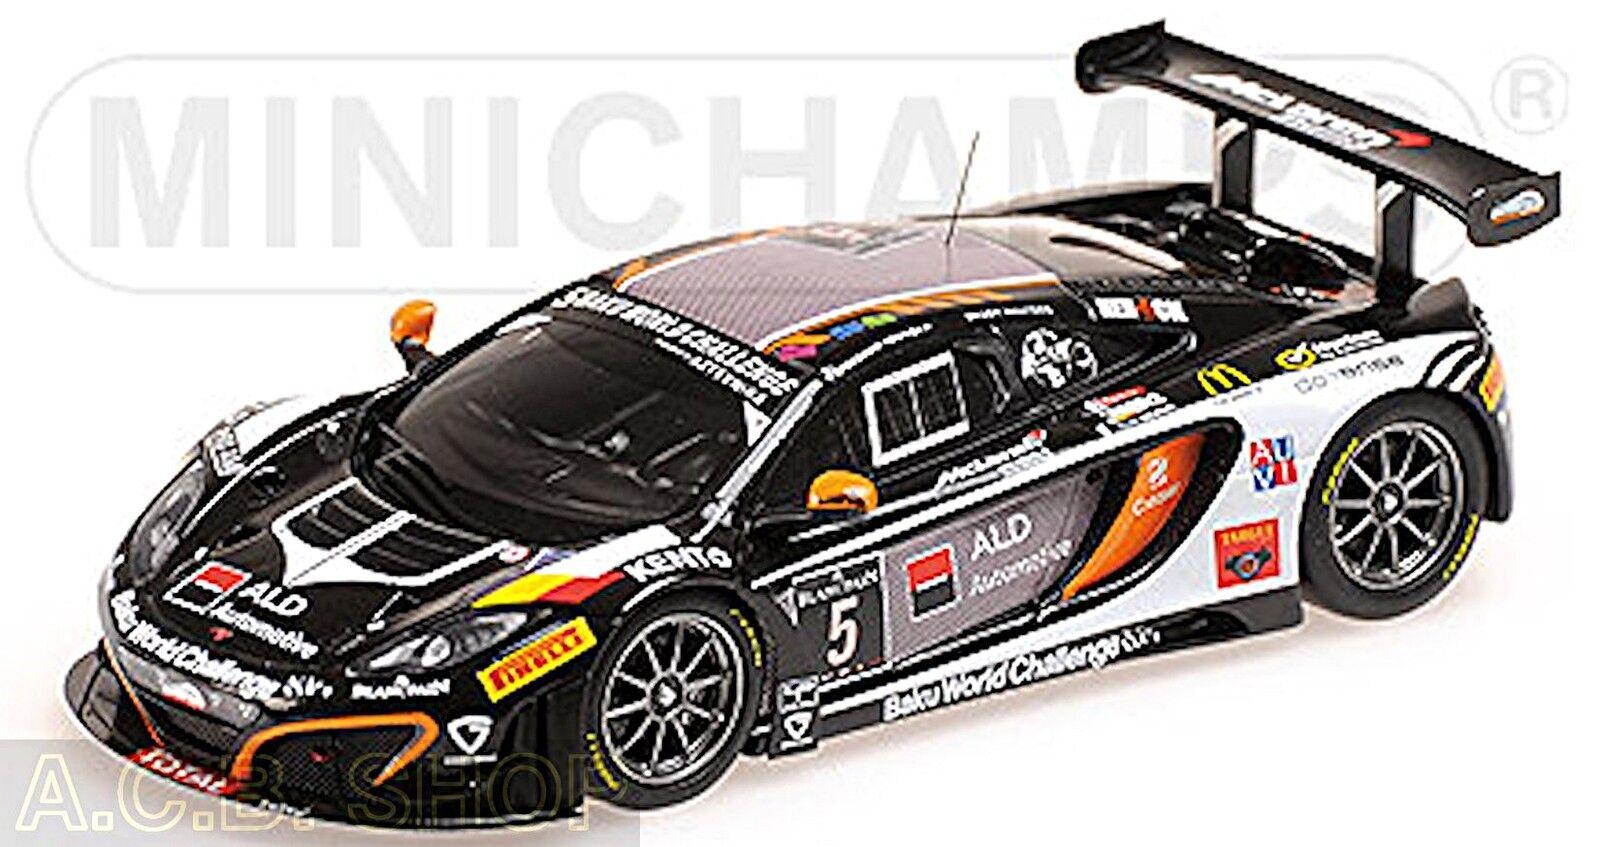 Mejor precio Mclaren 12c 12c 12c gt3 24h 2013 spa-boutson ginion racing  5 1 43 Minichamps  edición limitada